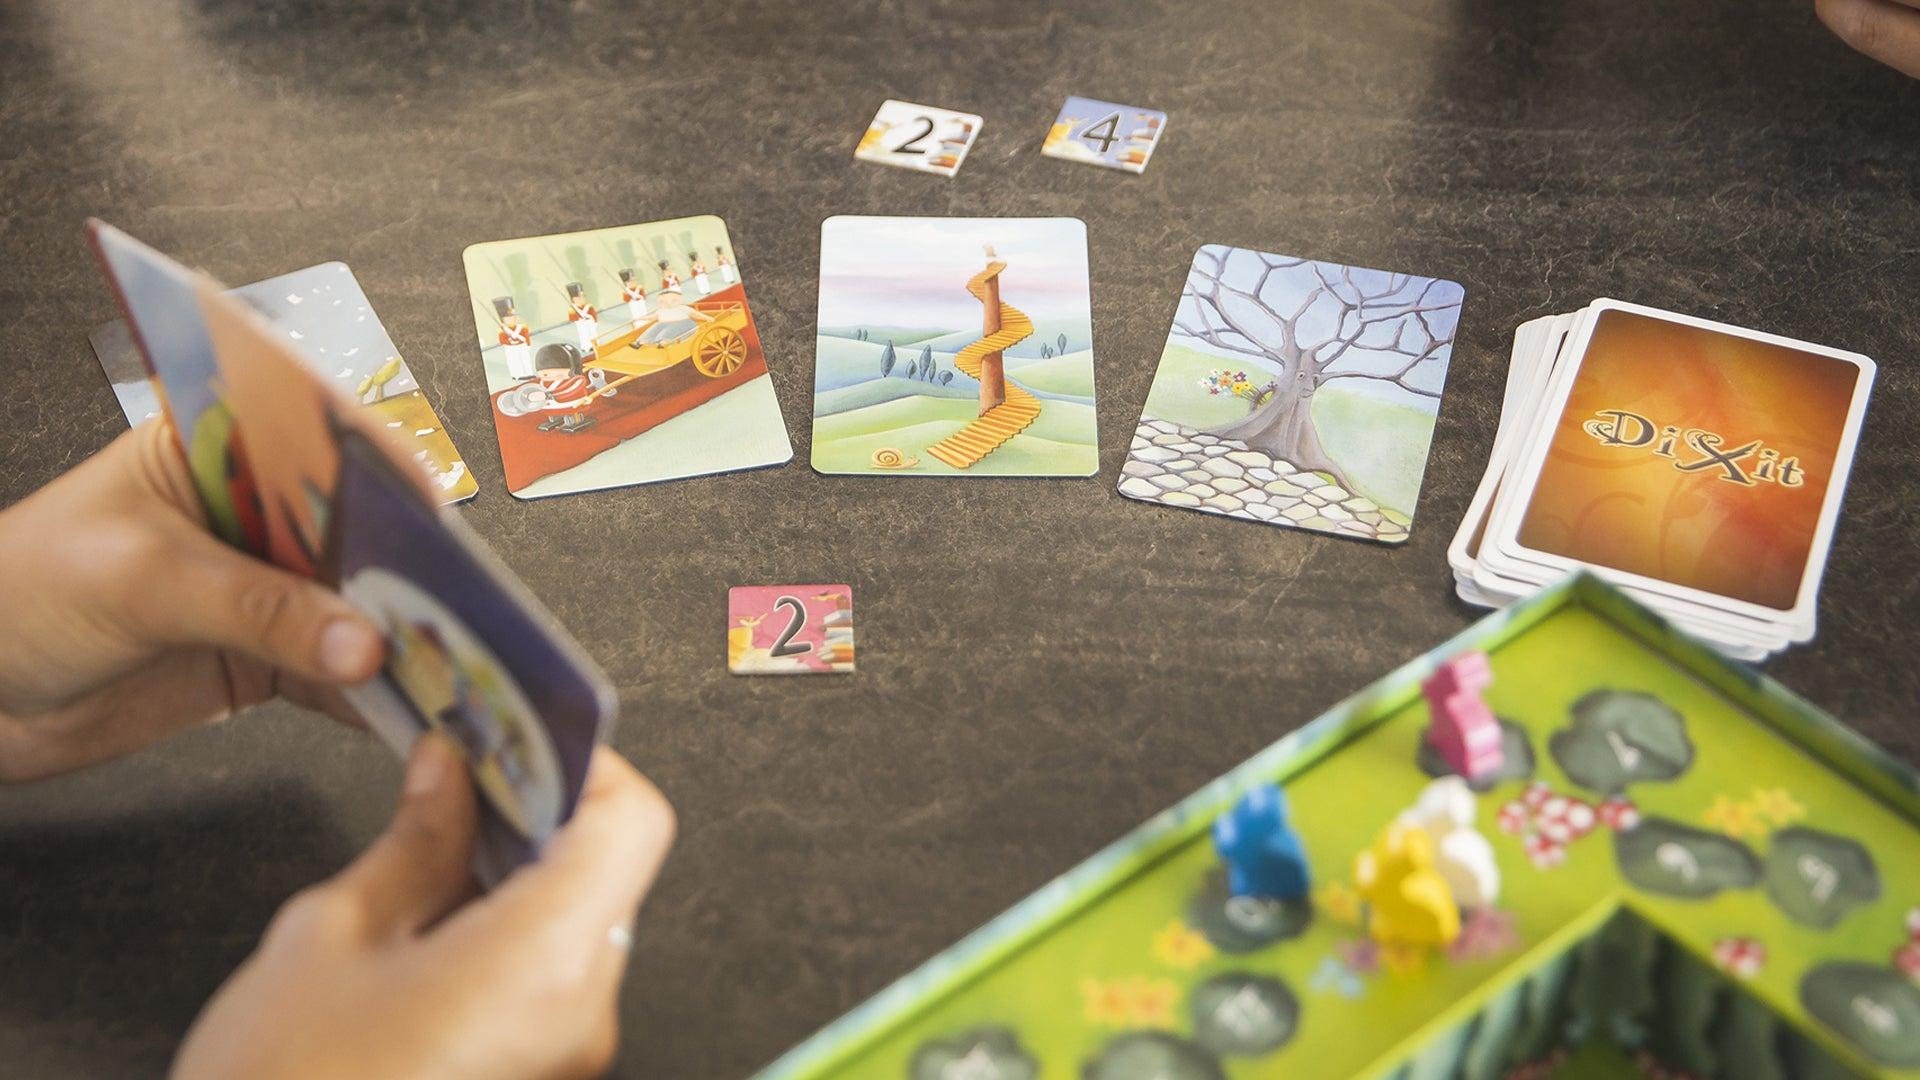 dixit-board-game-gameplay.jpg